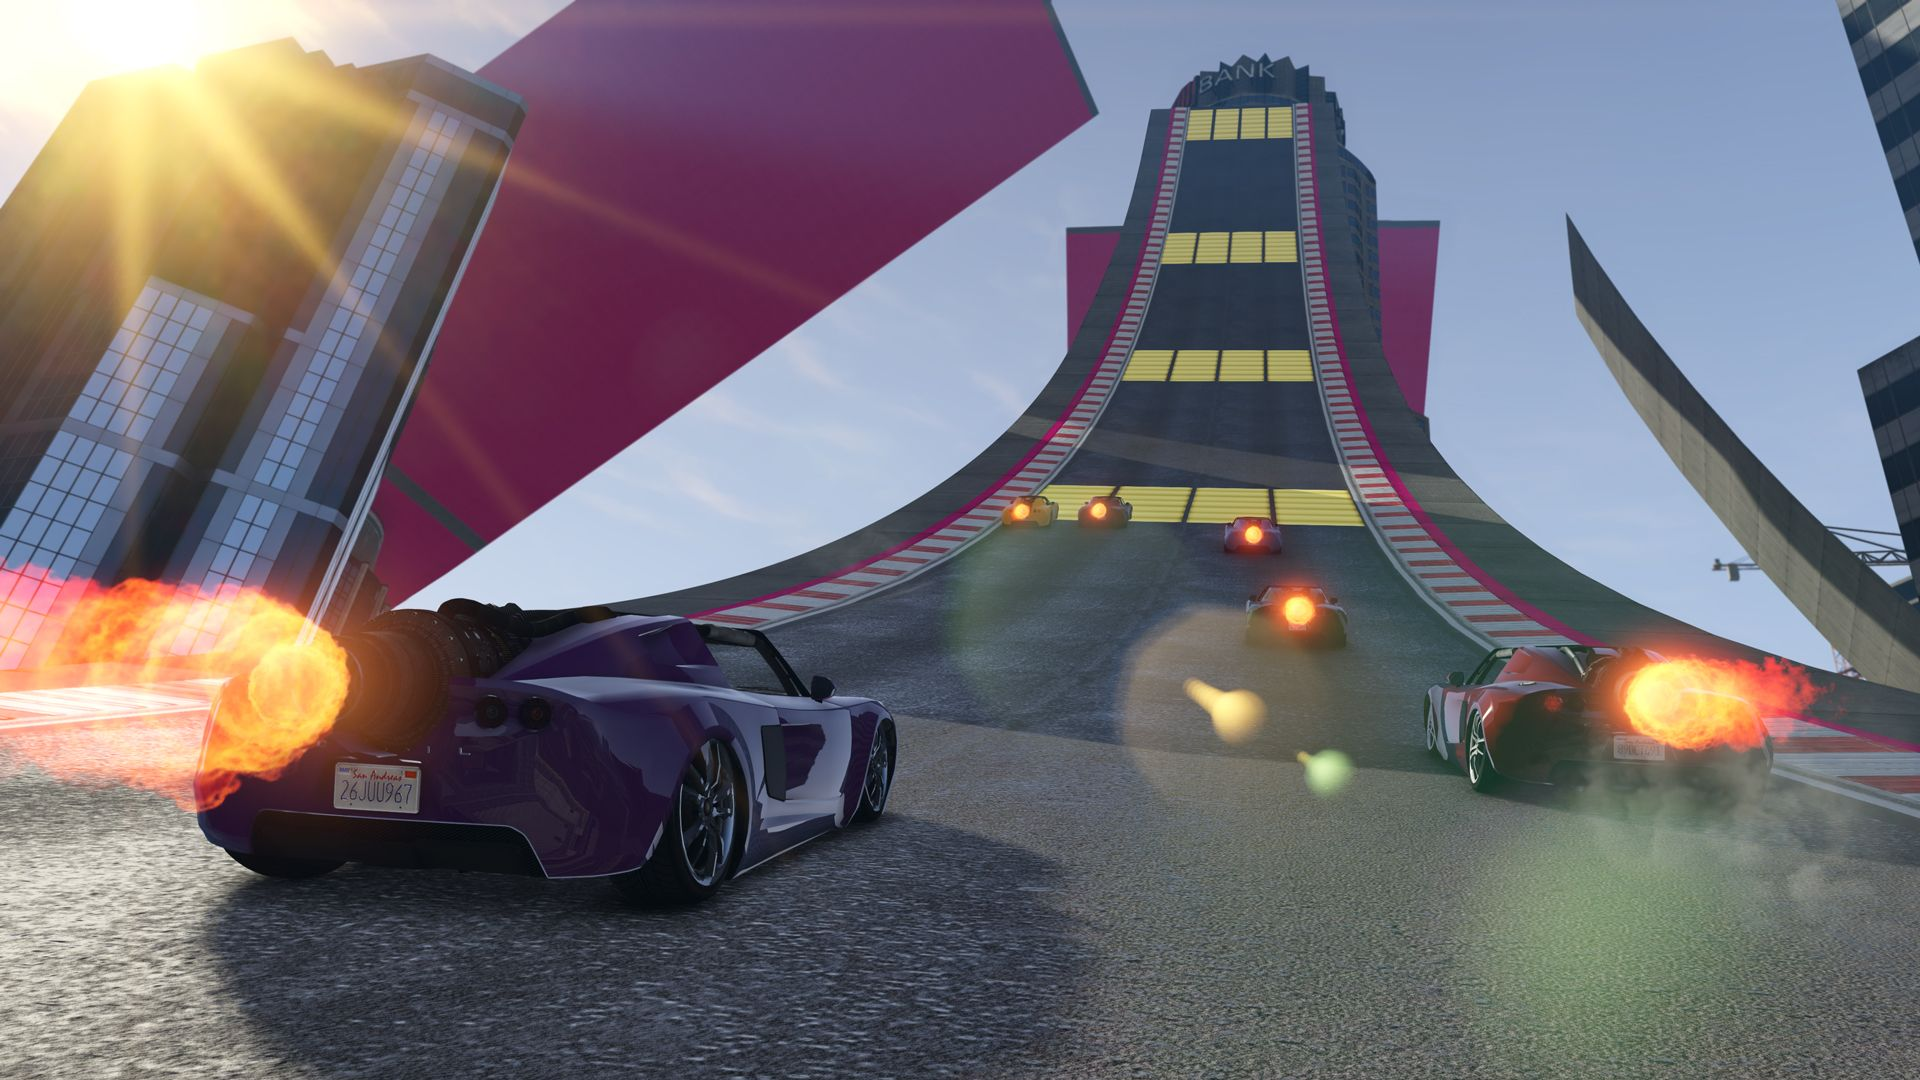 1000+ ideas about Auto Spiele Online on Pinterest | Hot wheels ...